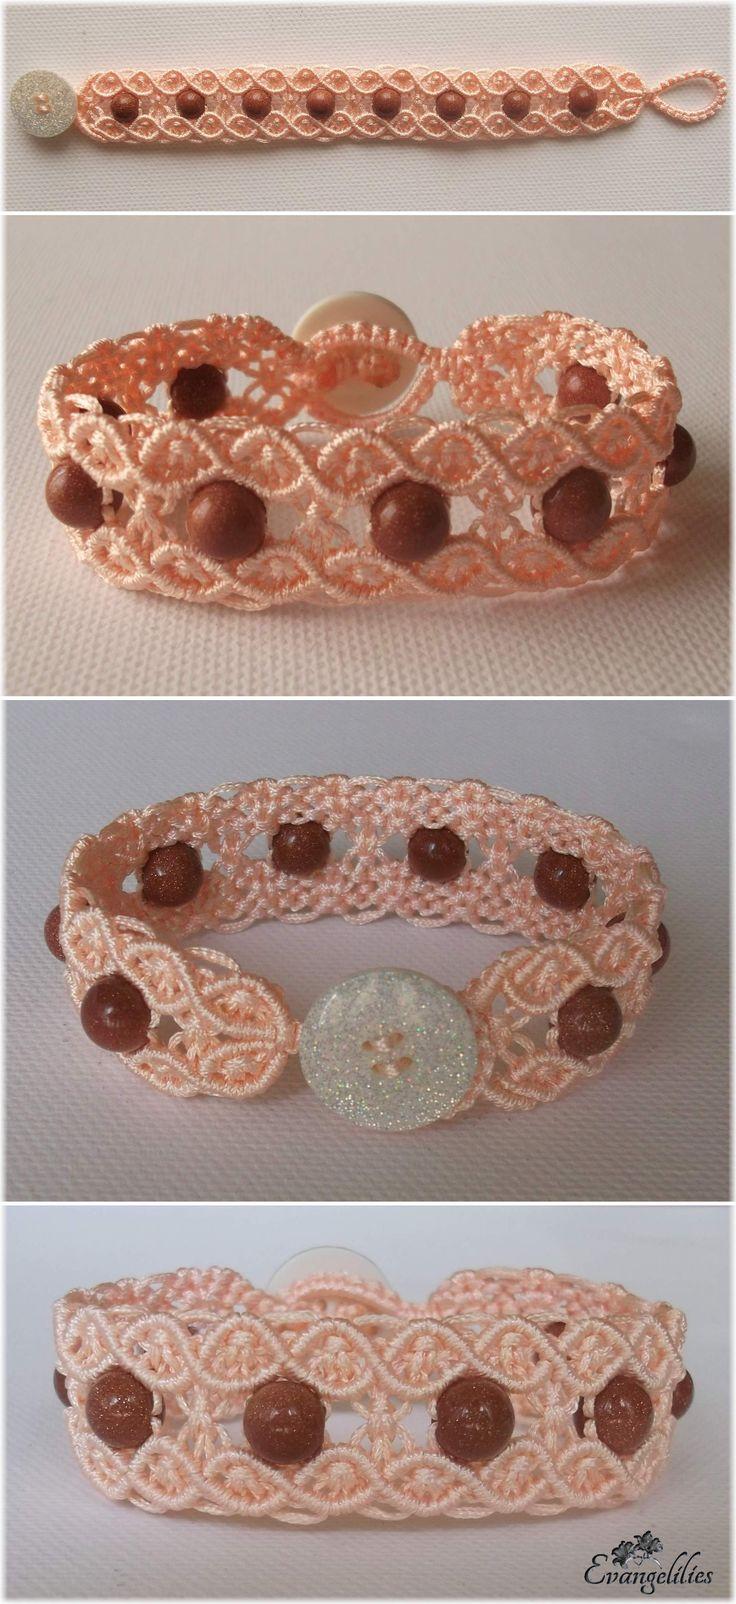 Macrame double wave bracelet with Goldsand stones. Video tutorial by Macrame School: https://www.youtube.com/watch?v=XTk_yqhGwiA